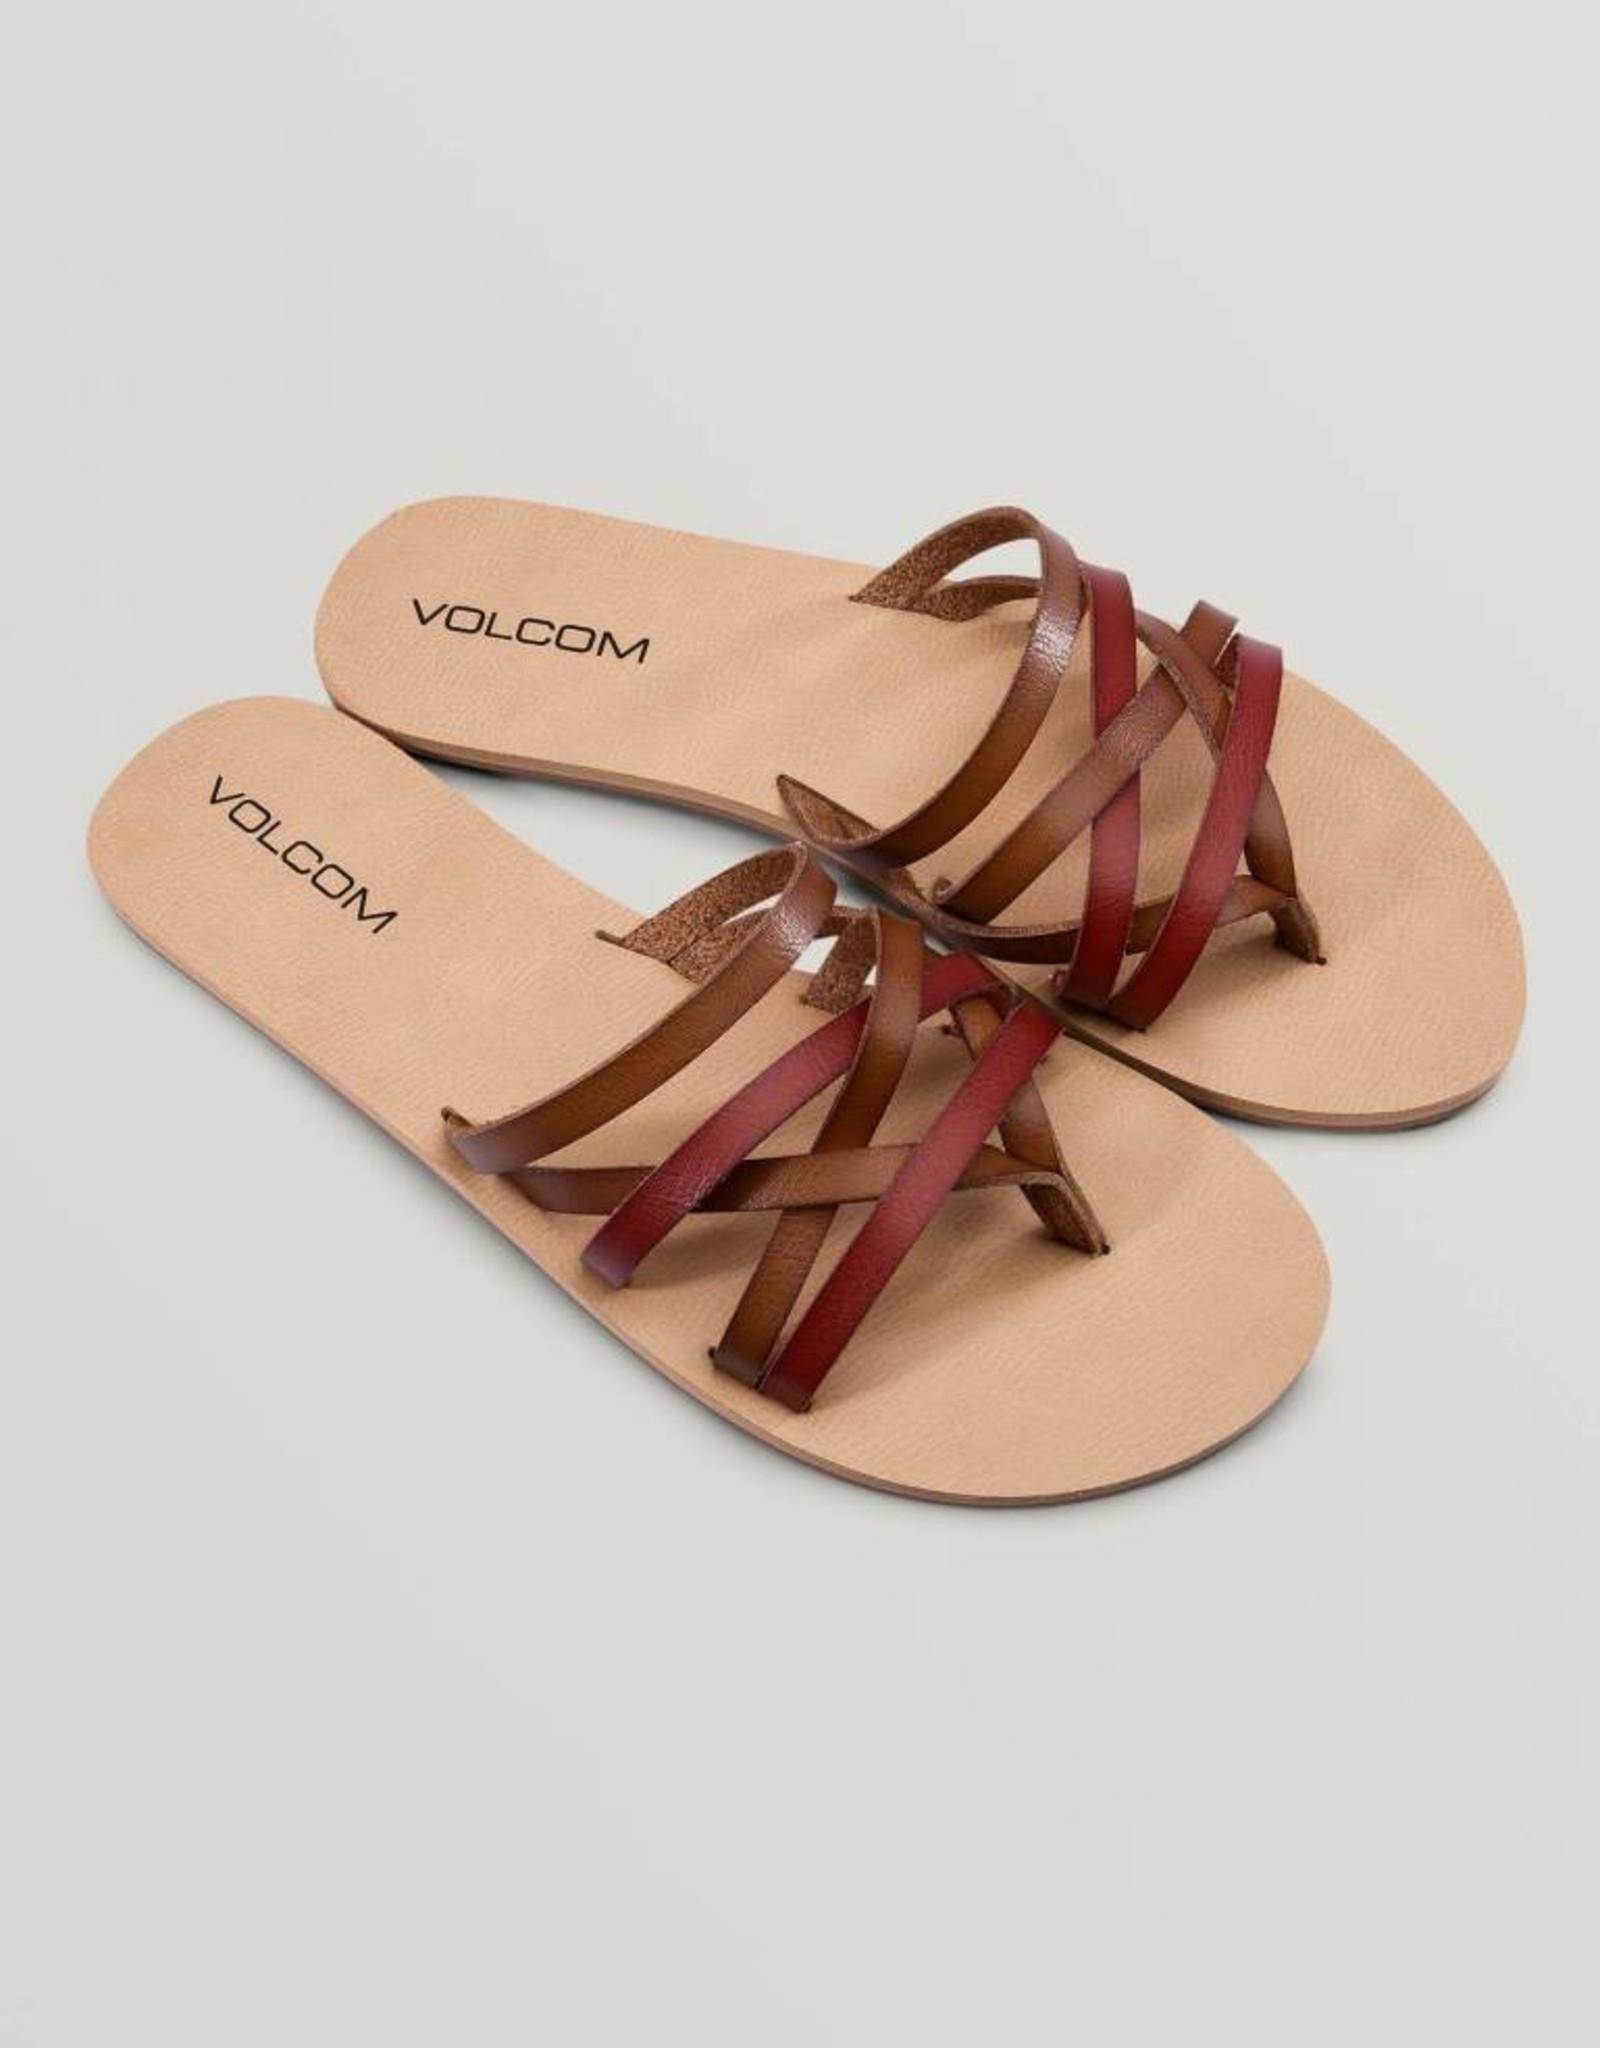 Volcom Volcom - Wmns LEGACY Sandal - Tan -